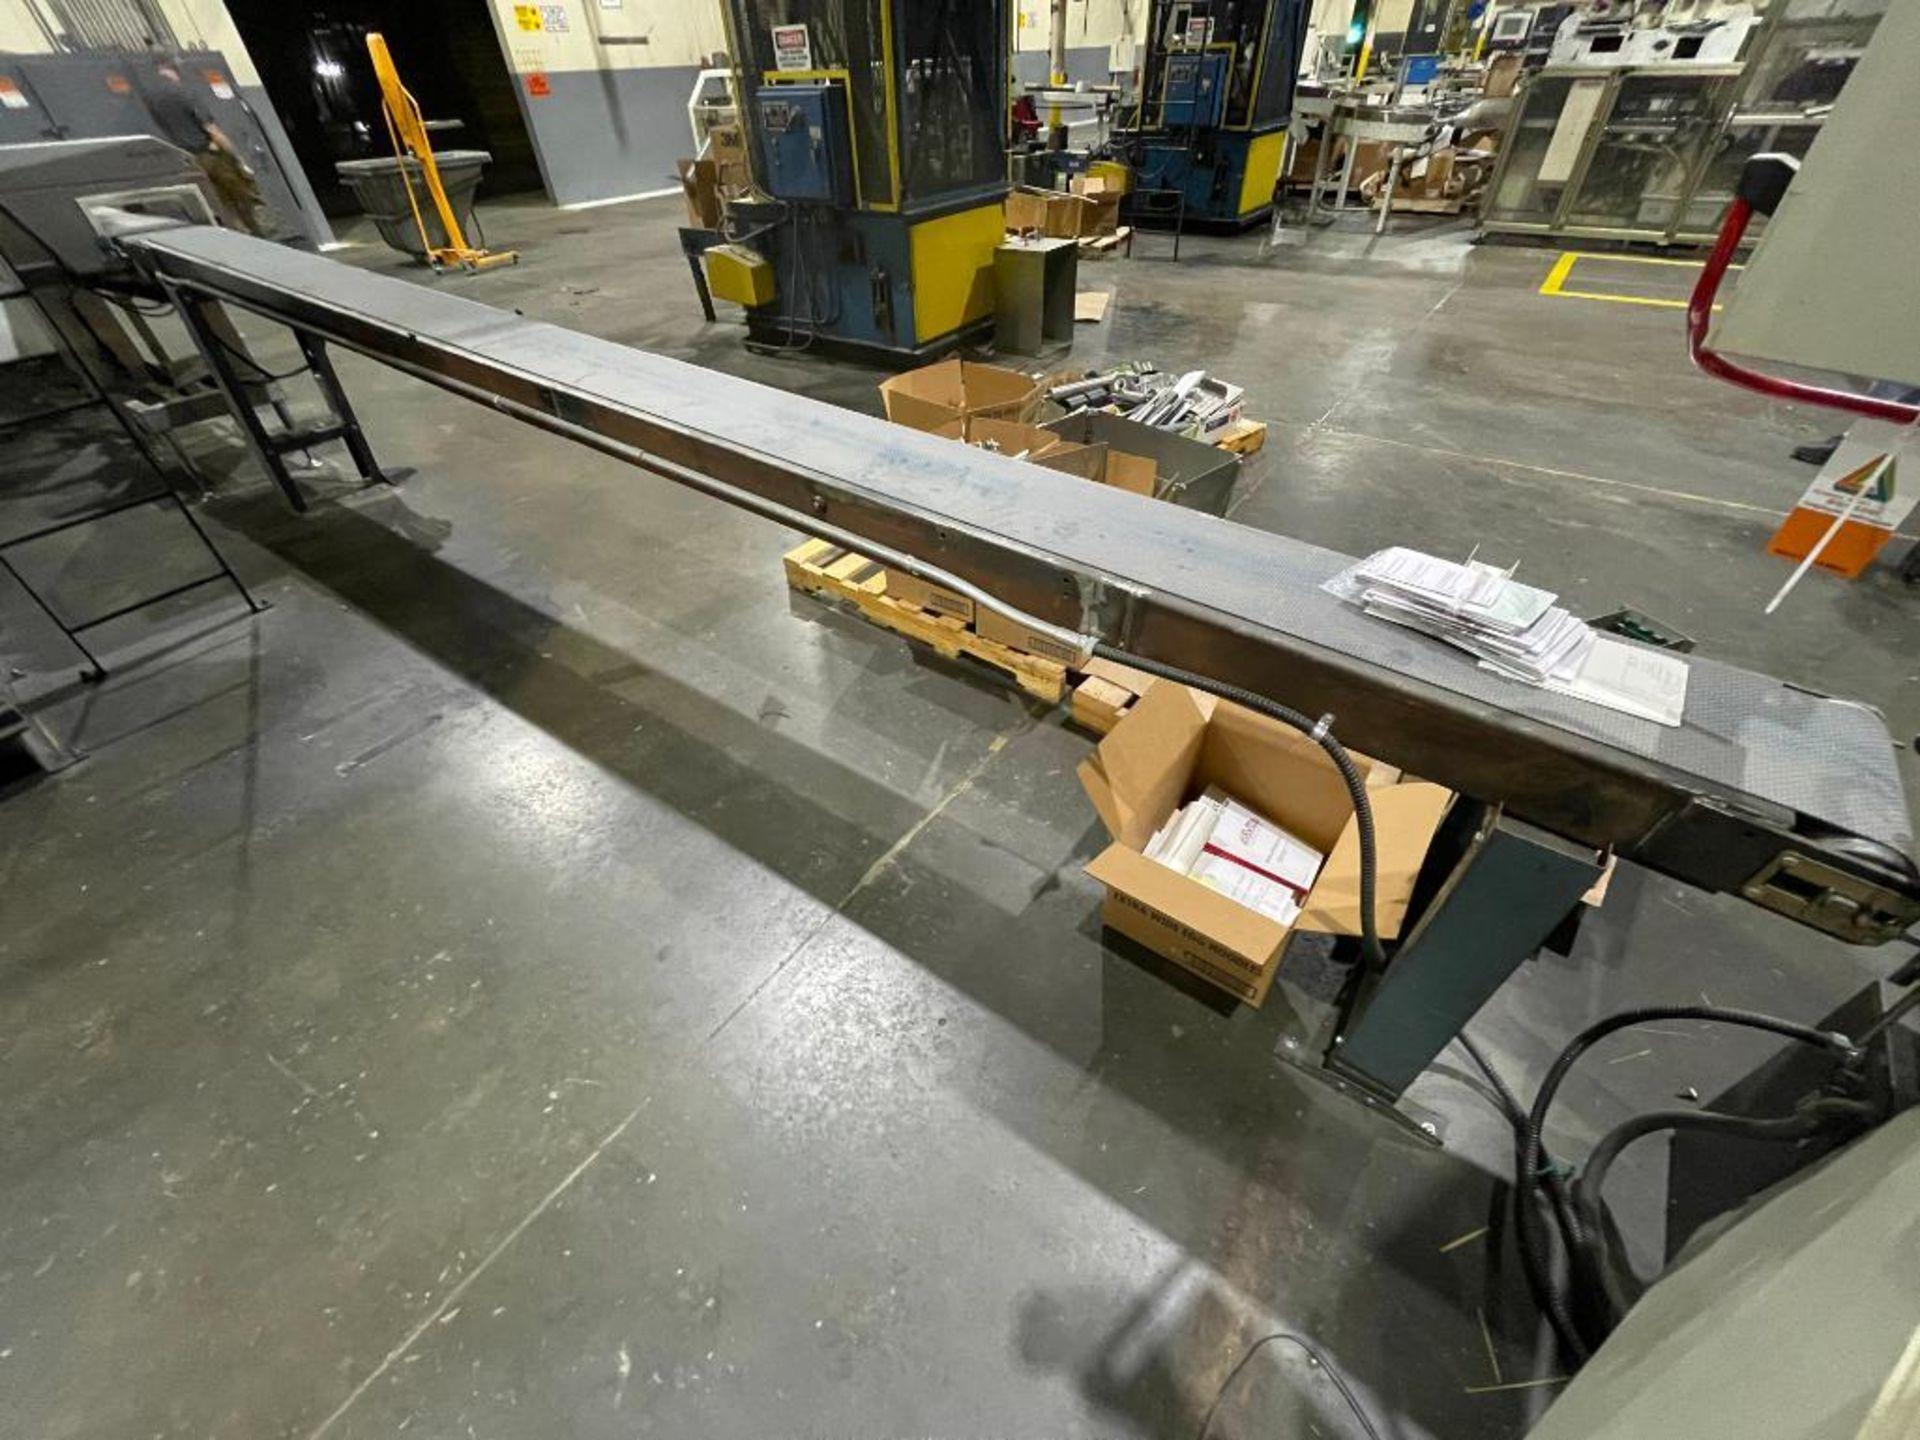 rubber belt conveyor - Image 2 of 7